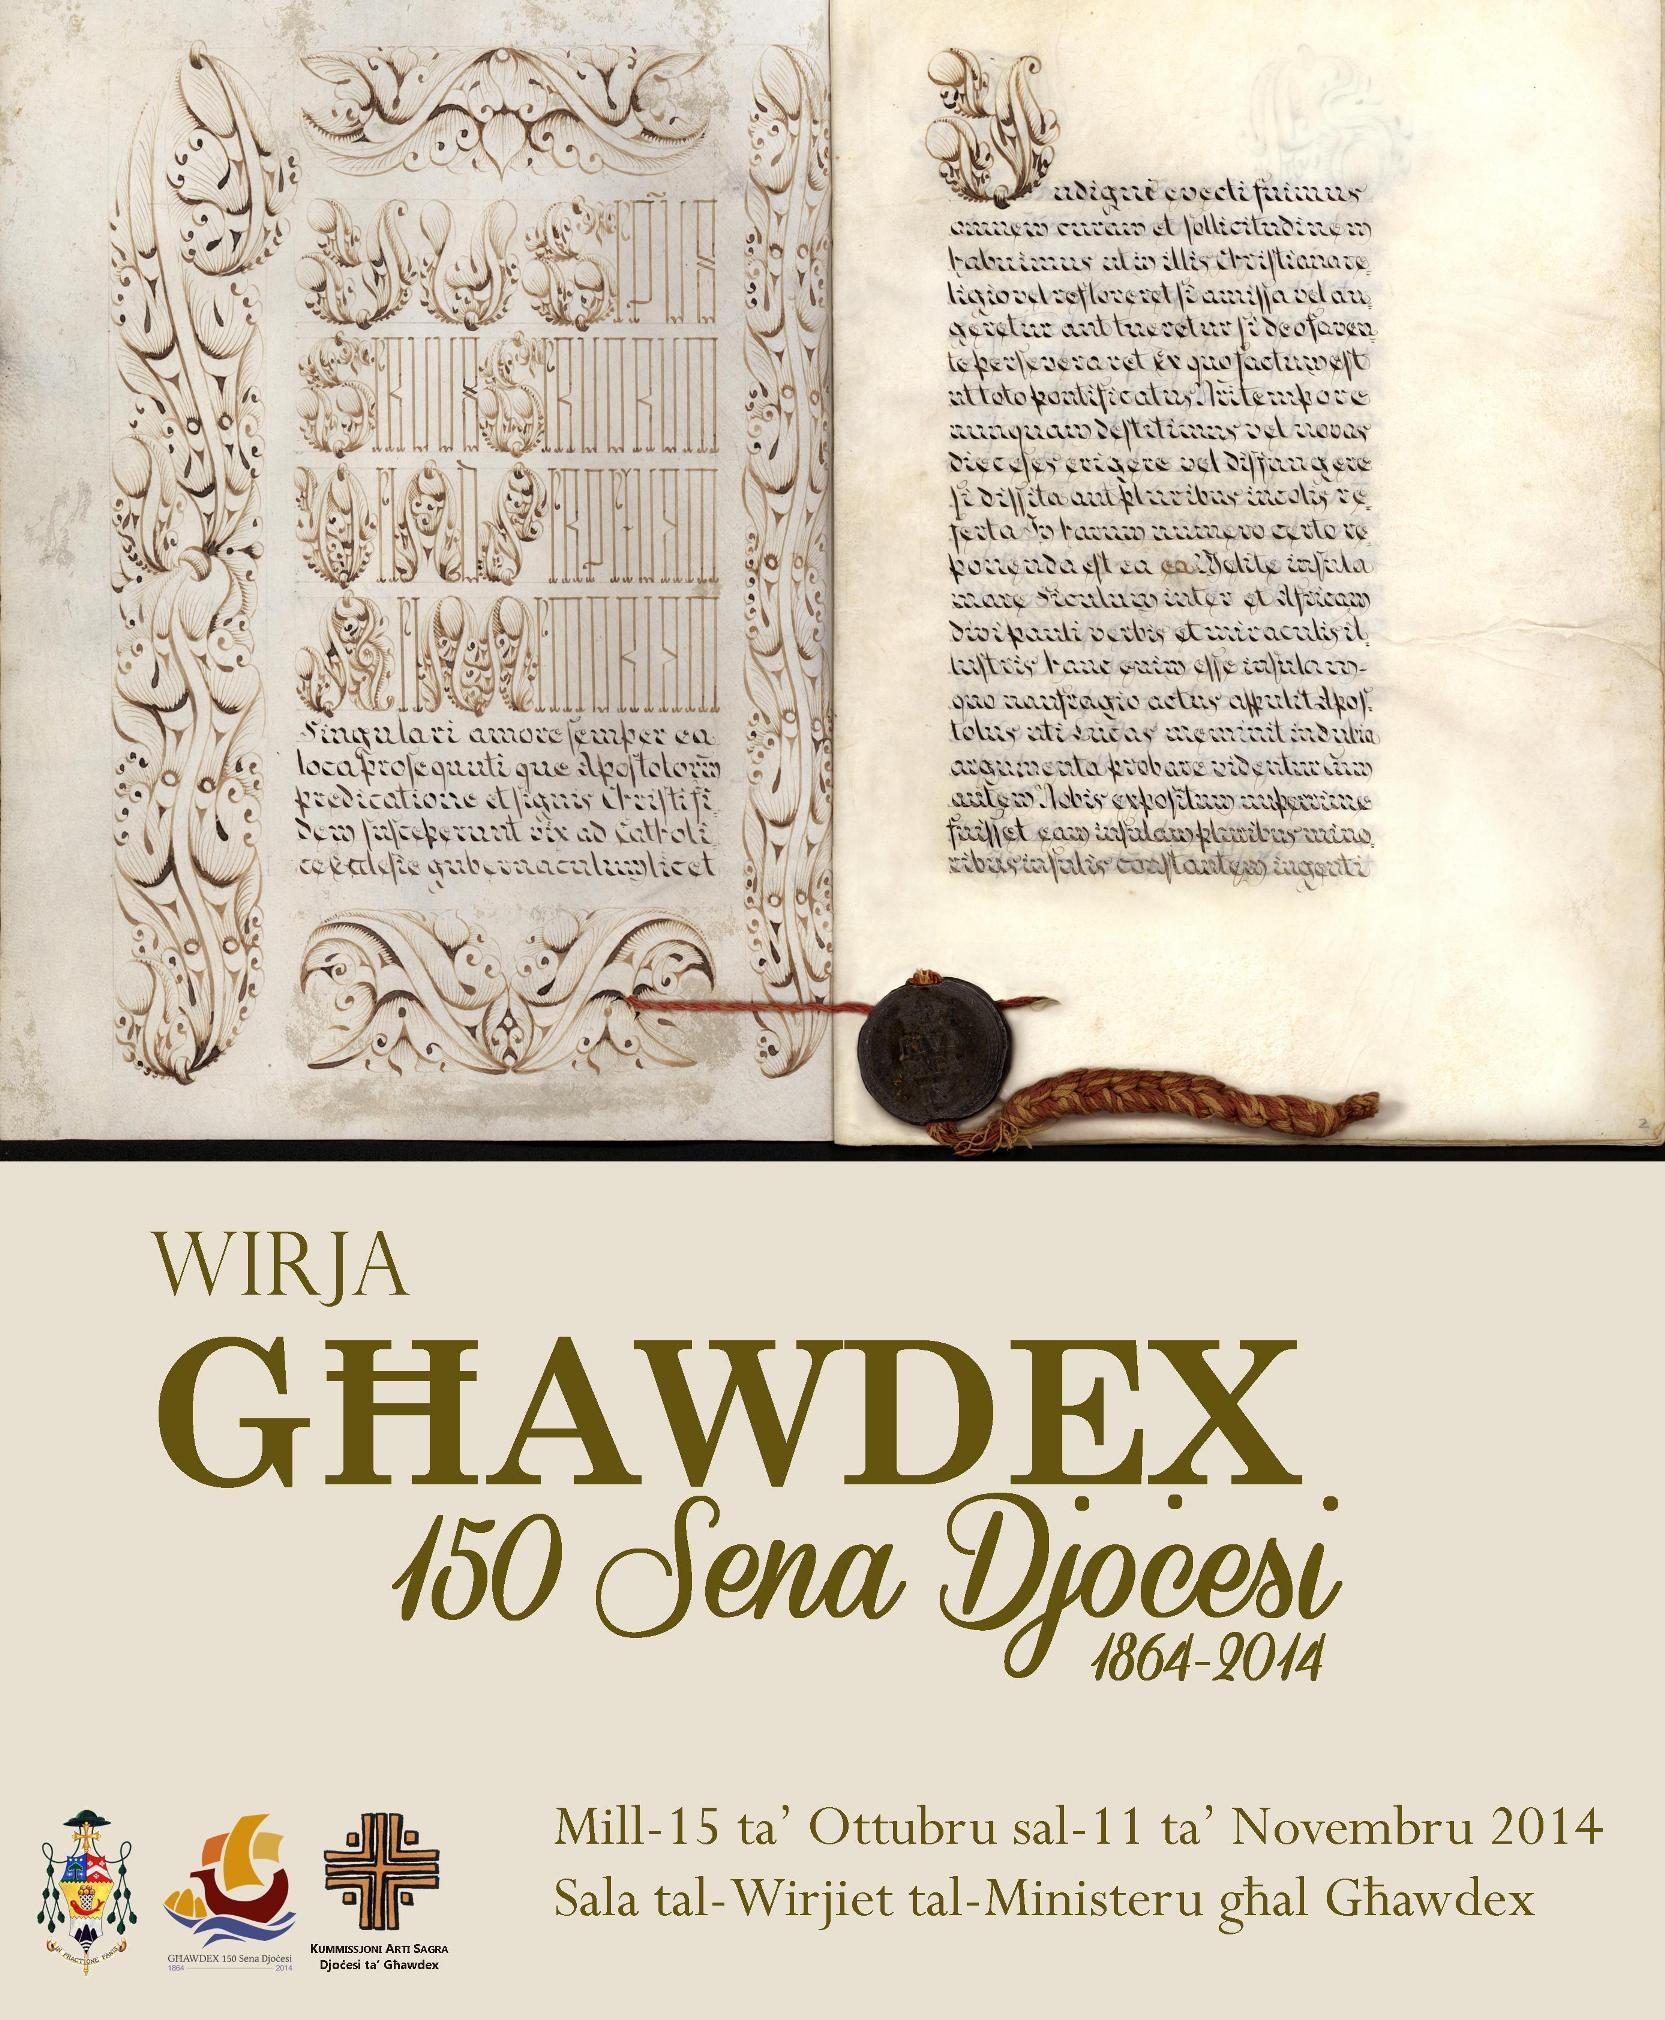 wirja-ghawdex-150-sena-djocesi.jpg